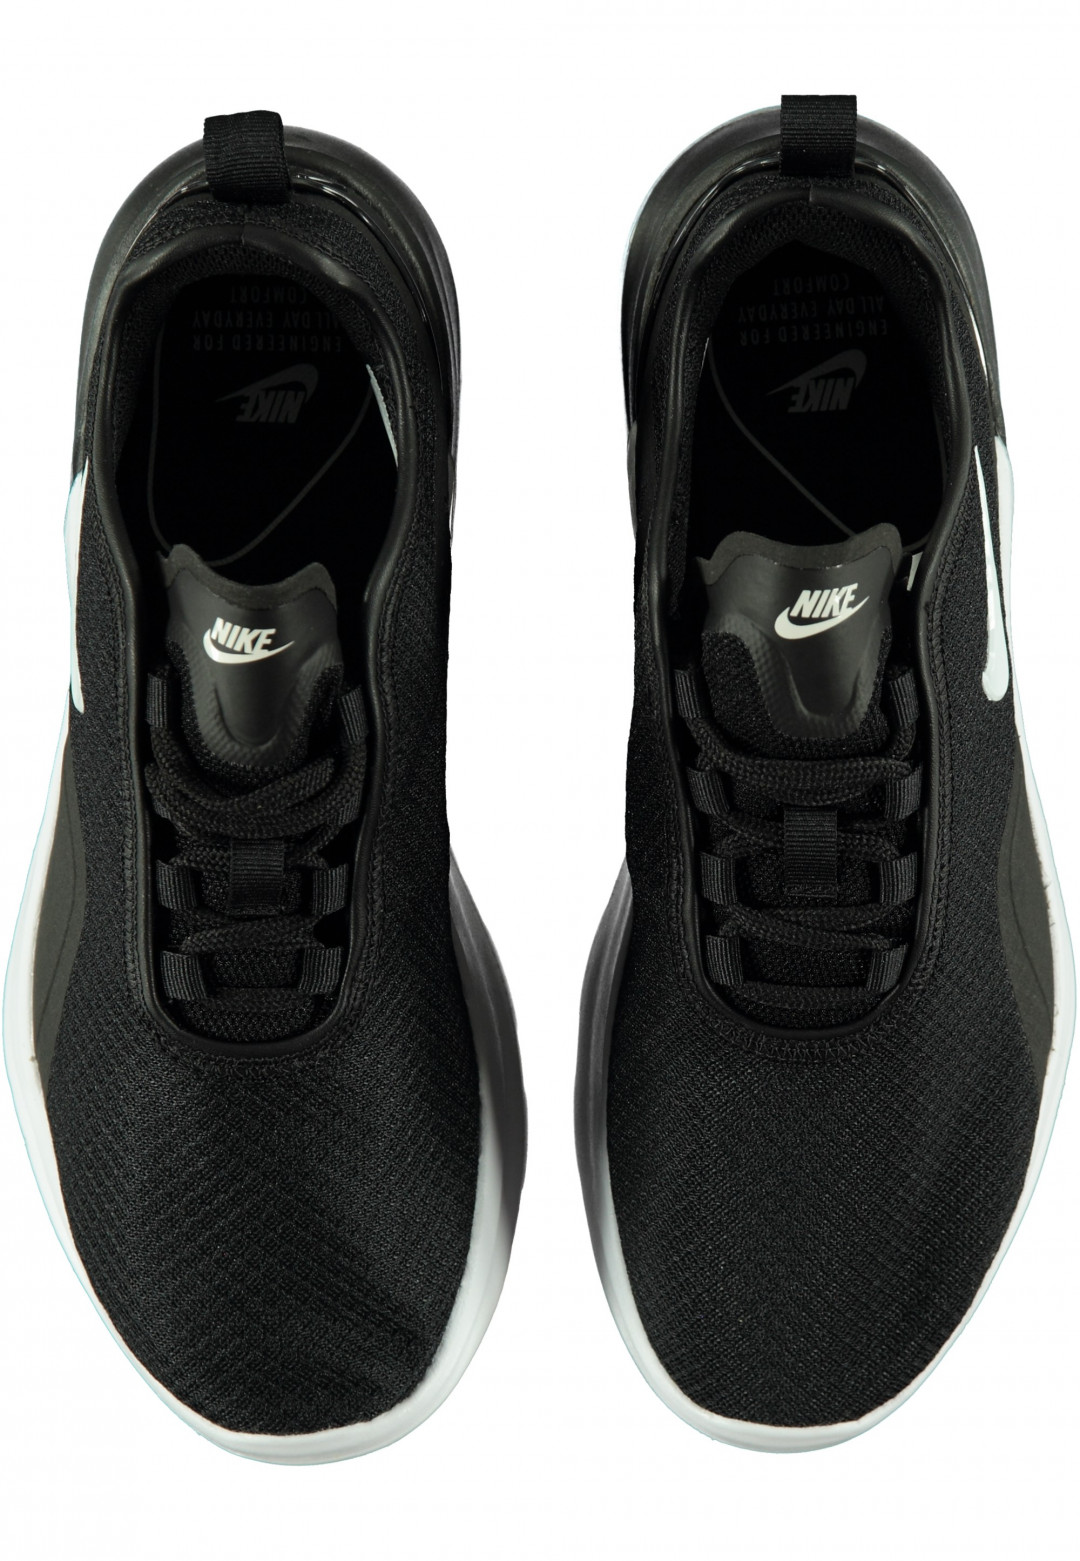 Sneakers WMNS Nike Air Max Motion 2 AO0352 007 | Nico